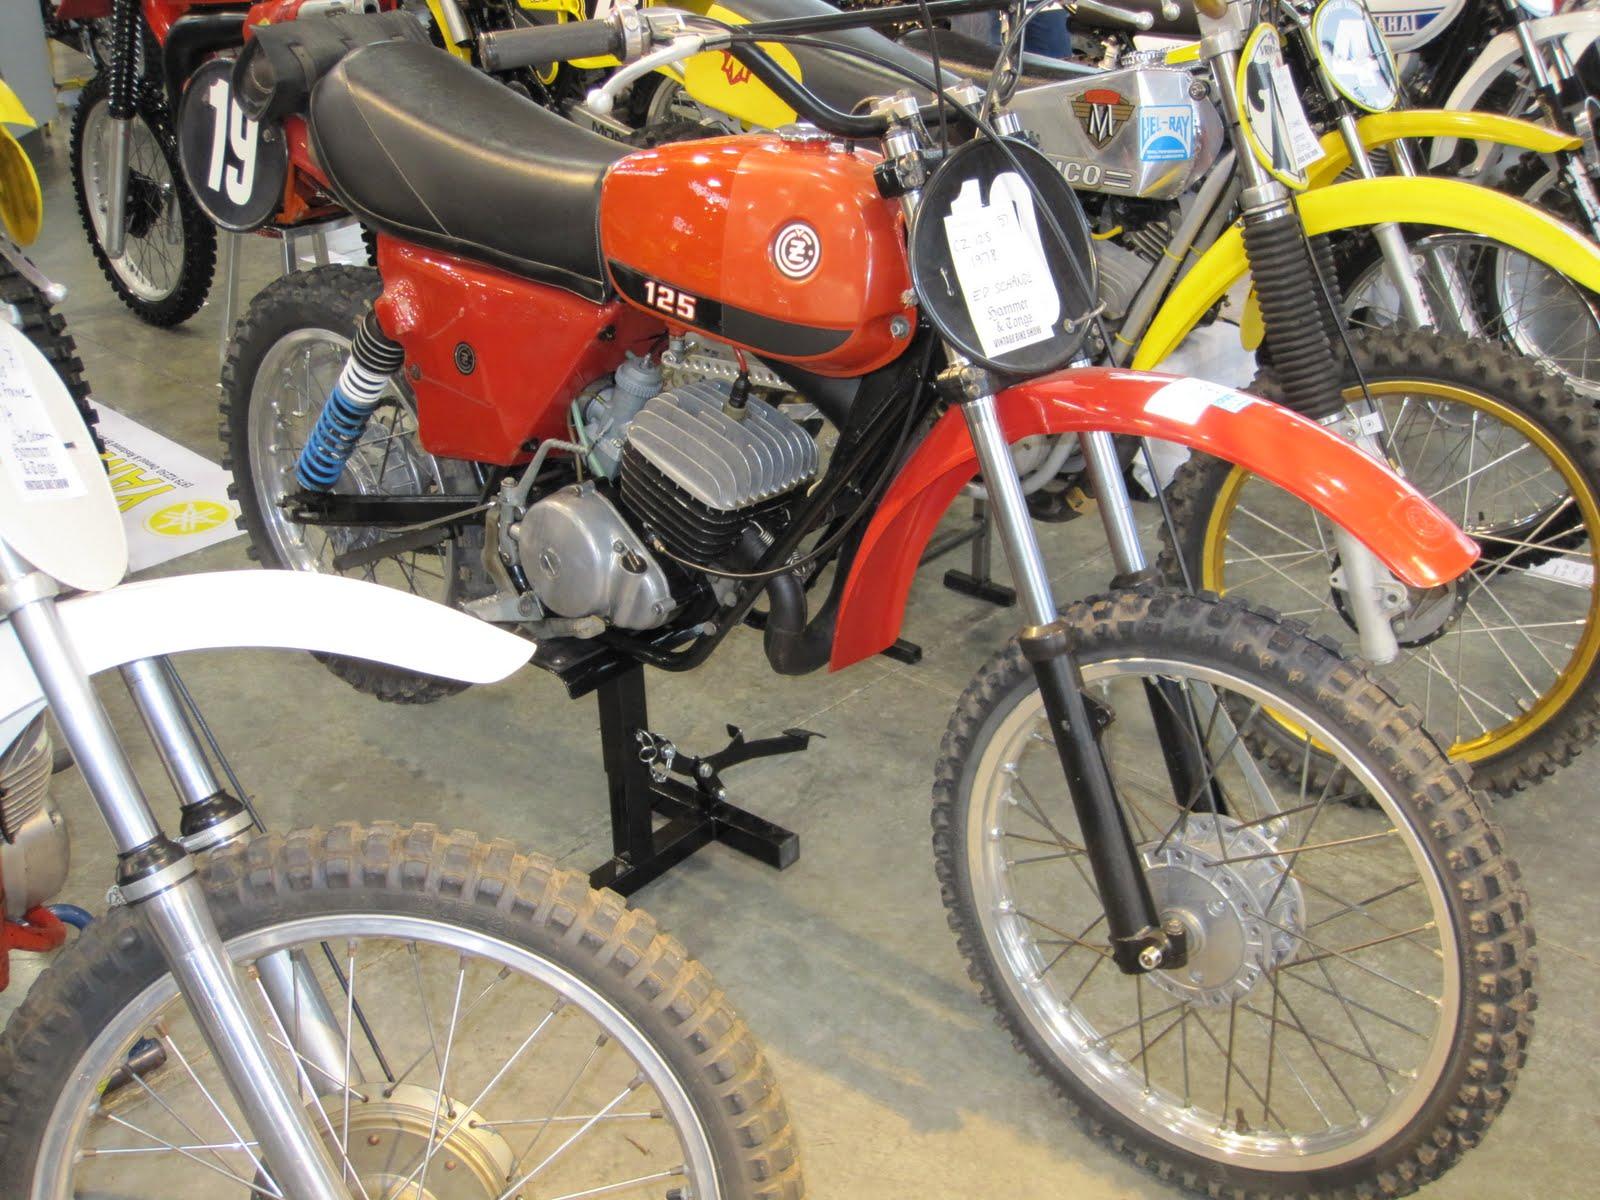 Yo Eddy !!: Vintage Motorcycle Show - Motocross a Go Go